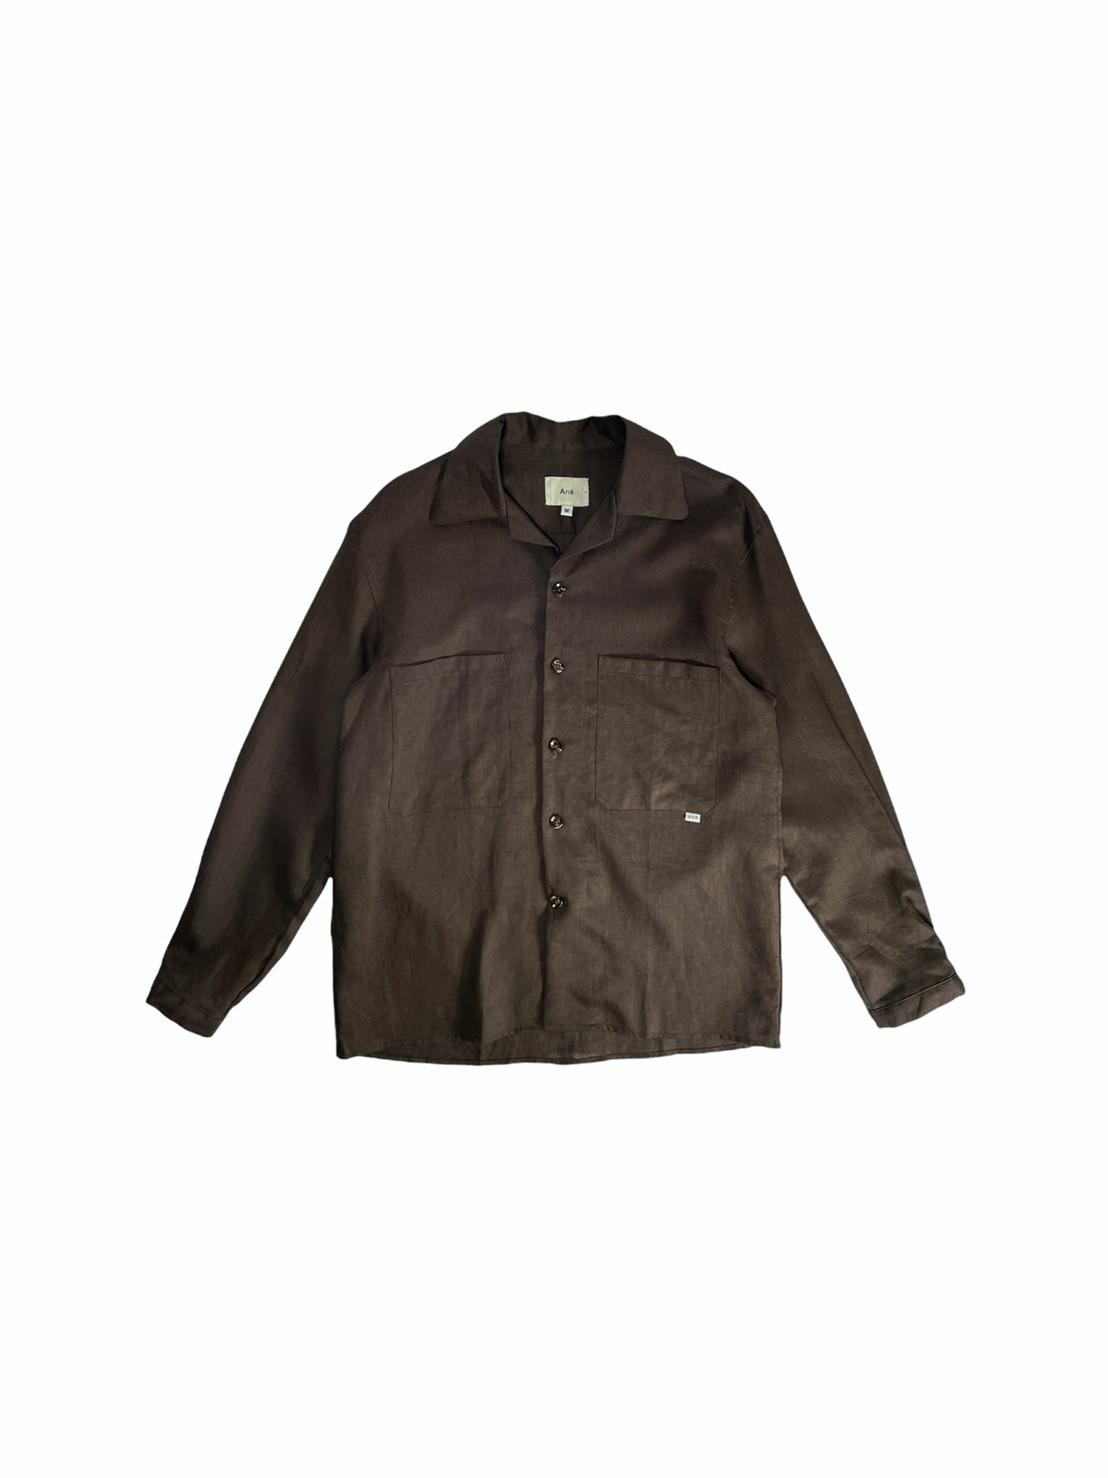 Ane Camp collar shirt (Dark brown linen)